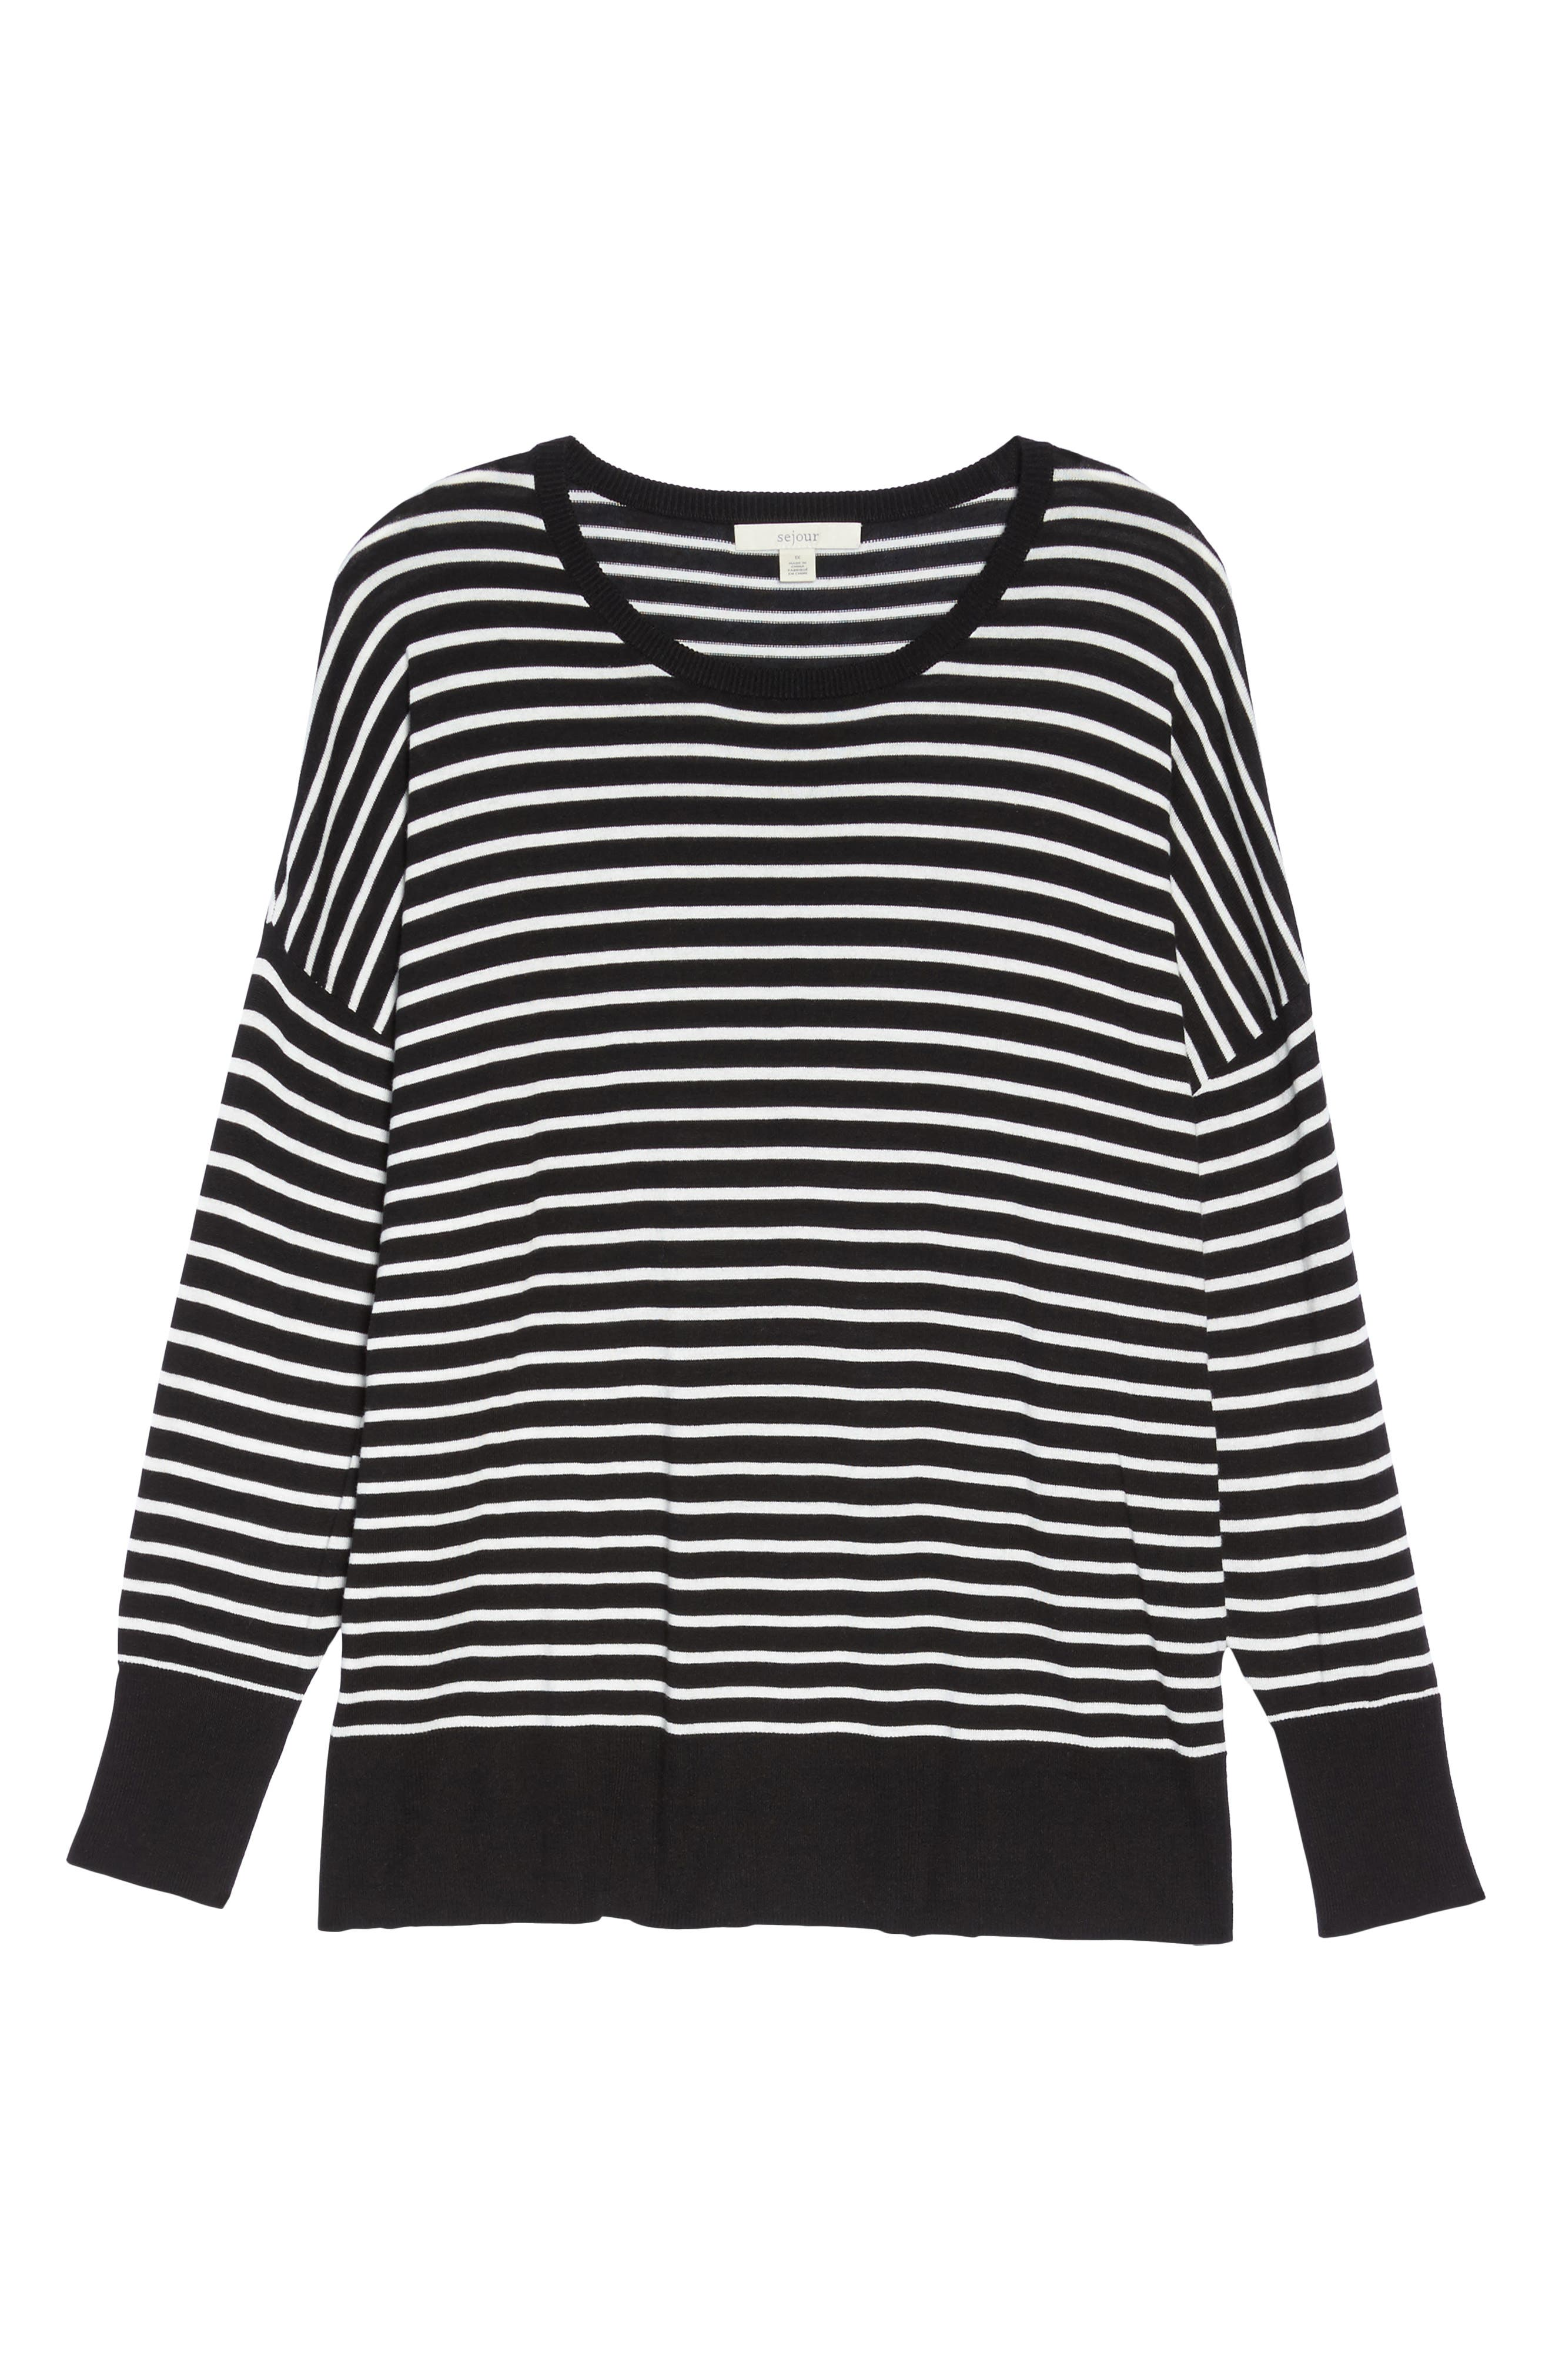 Dolman Sleeve Crewneck Sweater,                             Alternate thumbnail 6, color,                             002